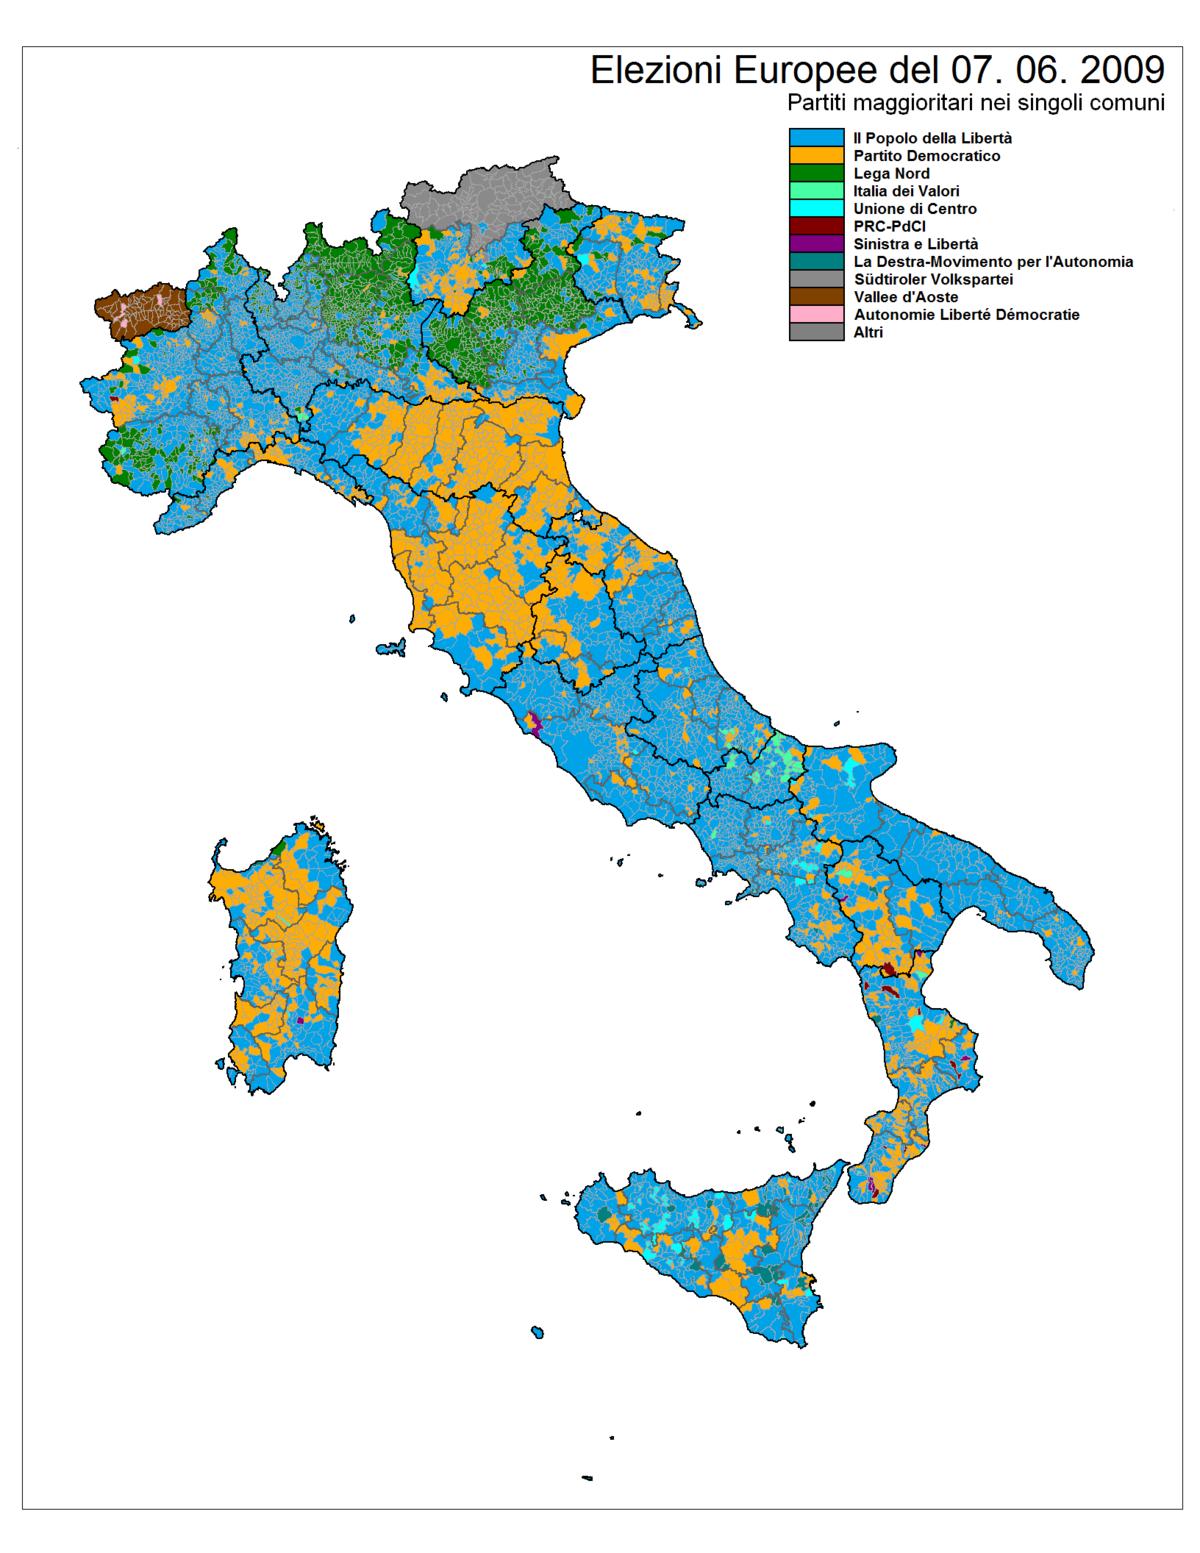 Elezioni europee del 2009 italia wikipedia for Numero deputati italiani